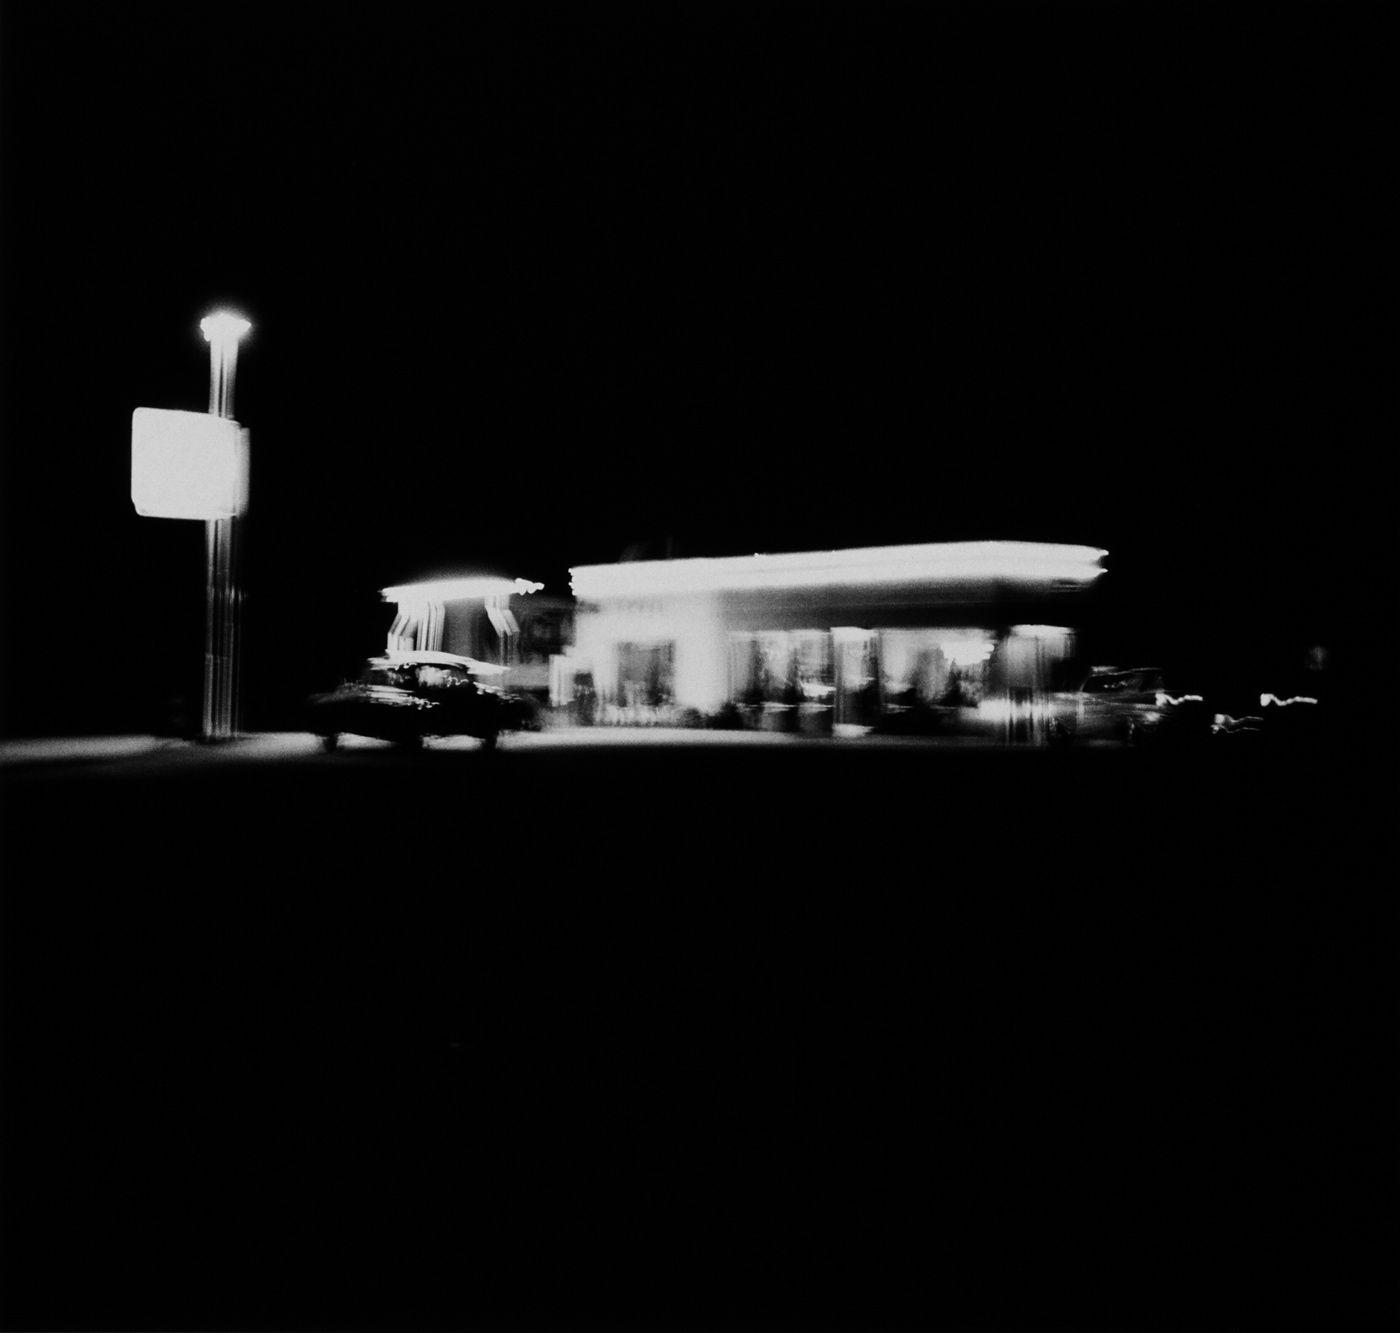 Ed Ruscha, Shell Station, Daggett, CA, 1962.